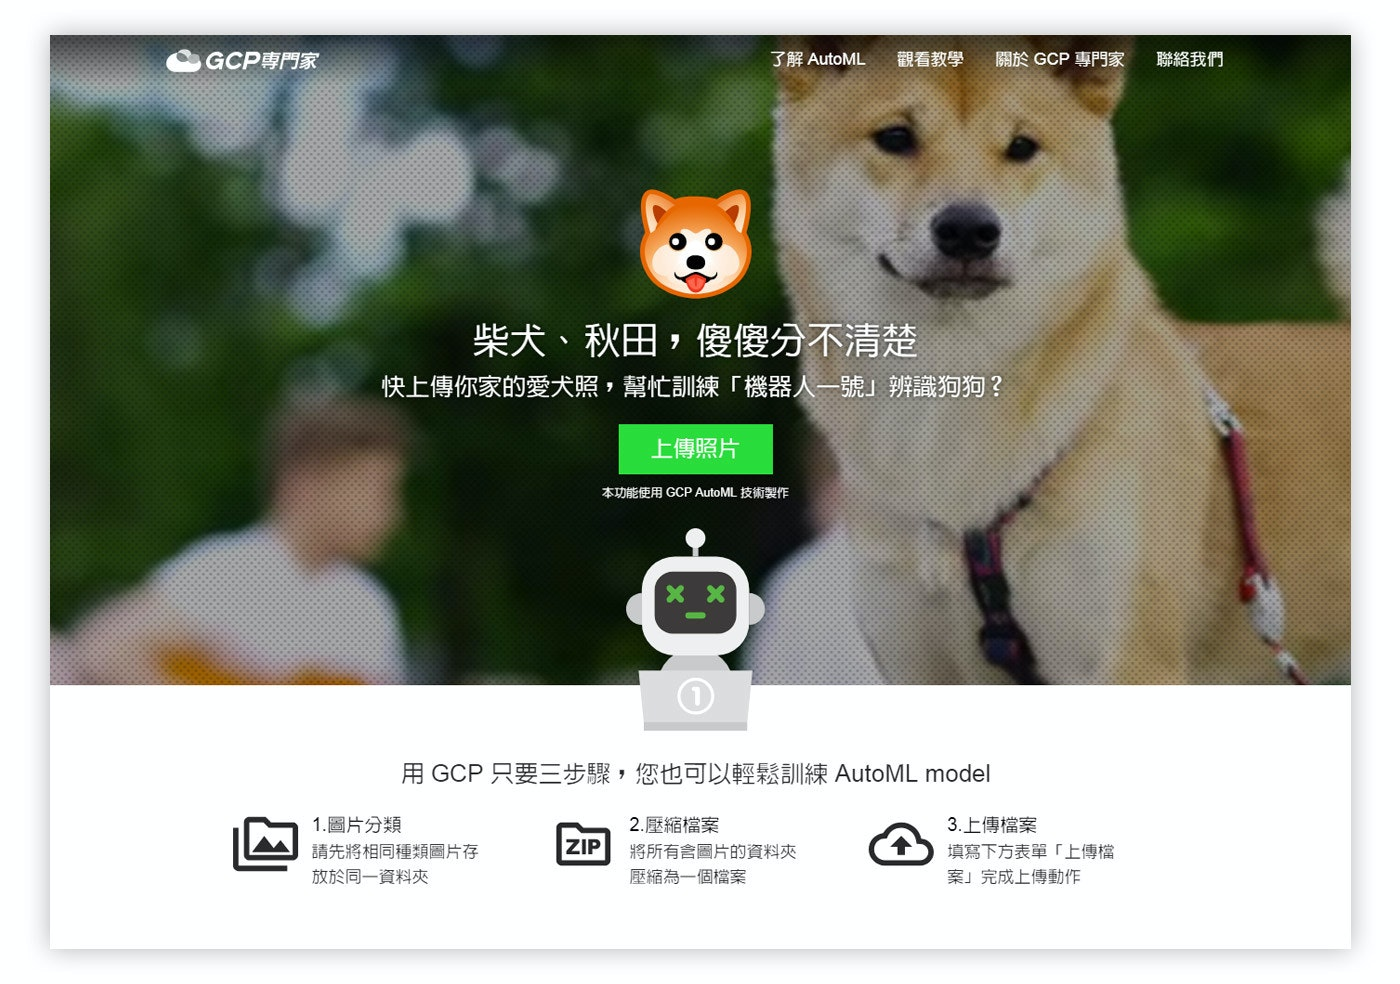 Dog breed, Dog, Video, Fauna, Snout, Brand, Breed, Photograph, photo caption, fauna, dog like mammal, photo caption, dog, dog breed group, dog breed, website, snout, brand